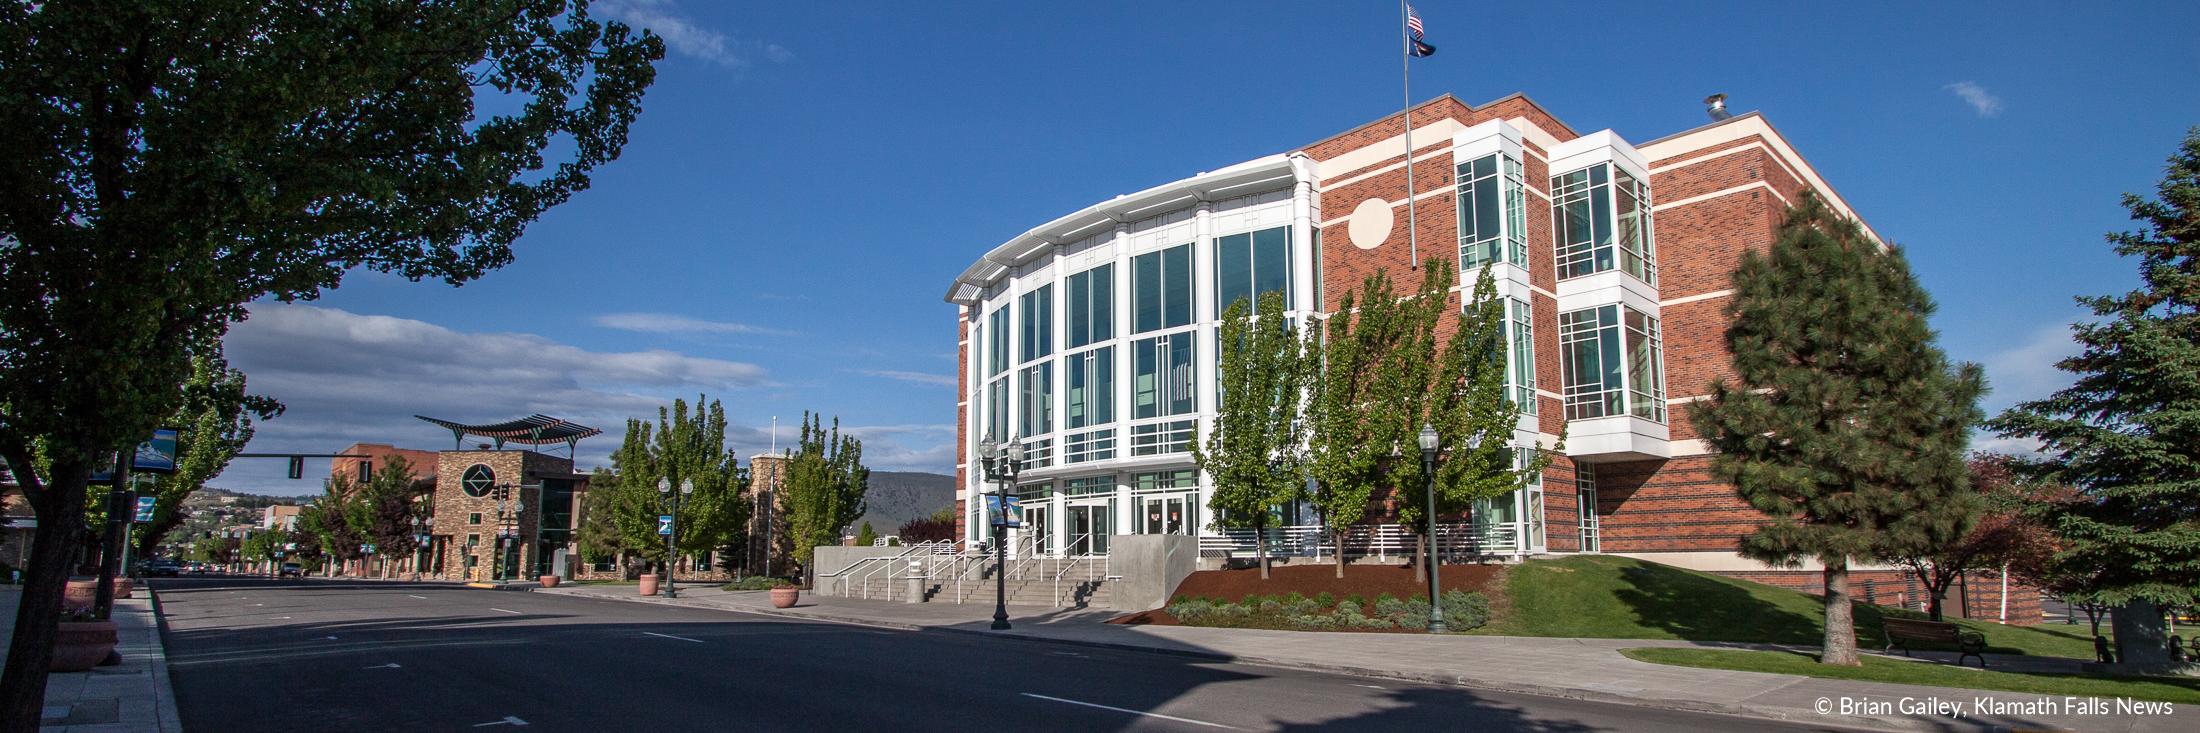 Main Street, Klamath Falls. (File Photo, Klamath Falls News)